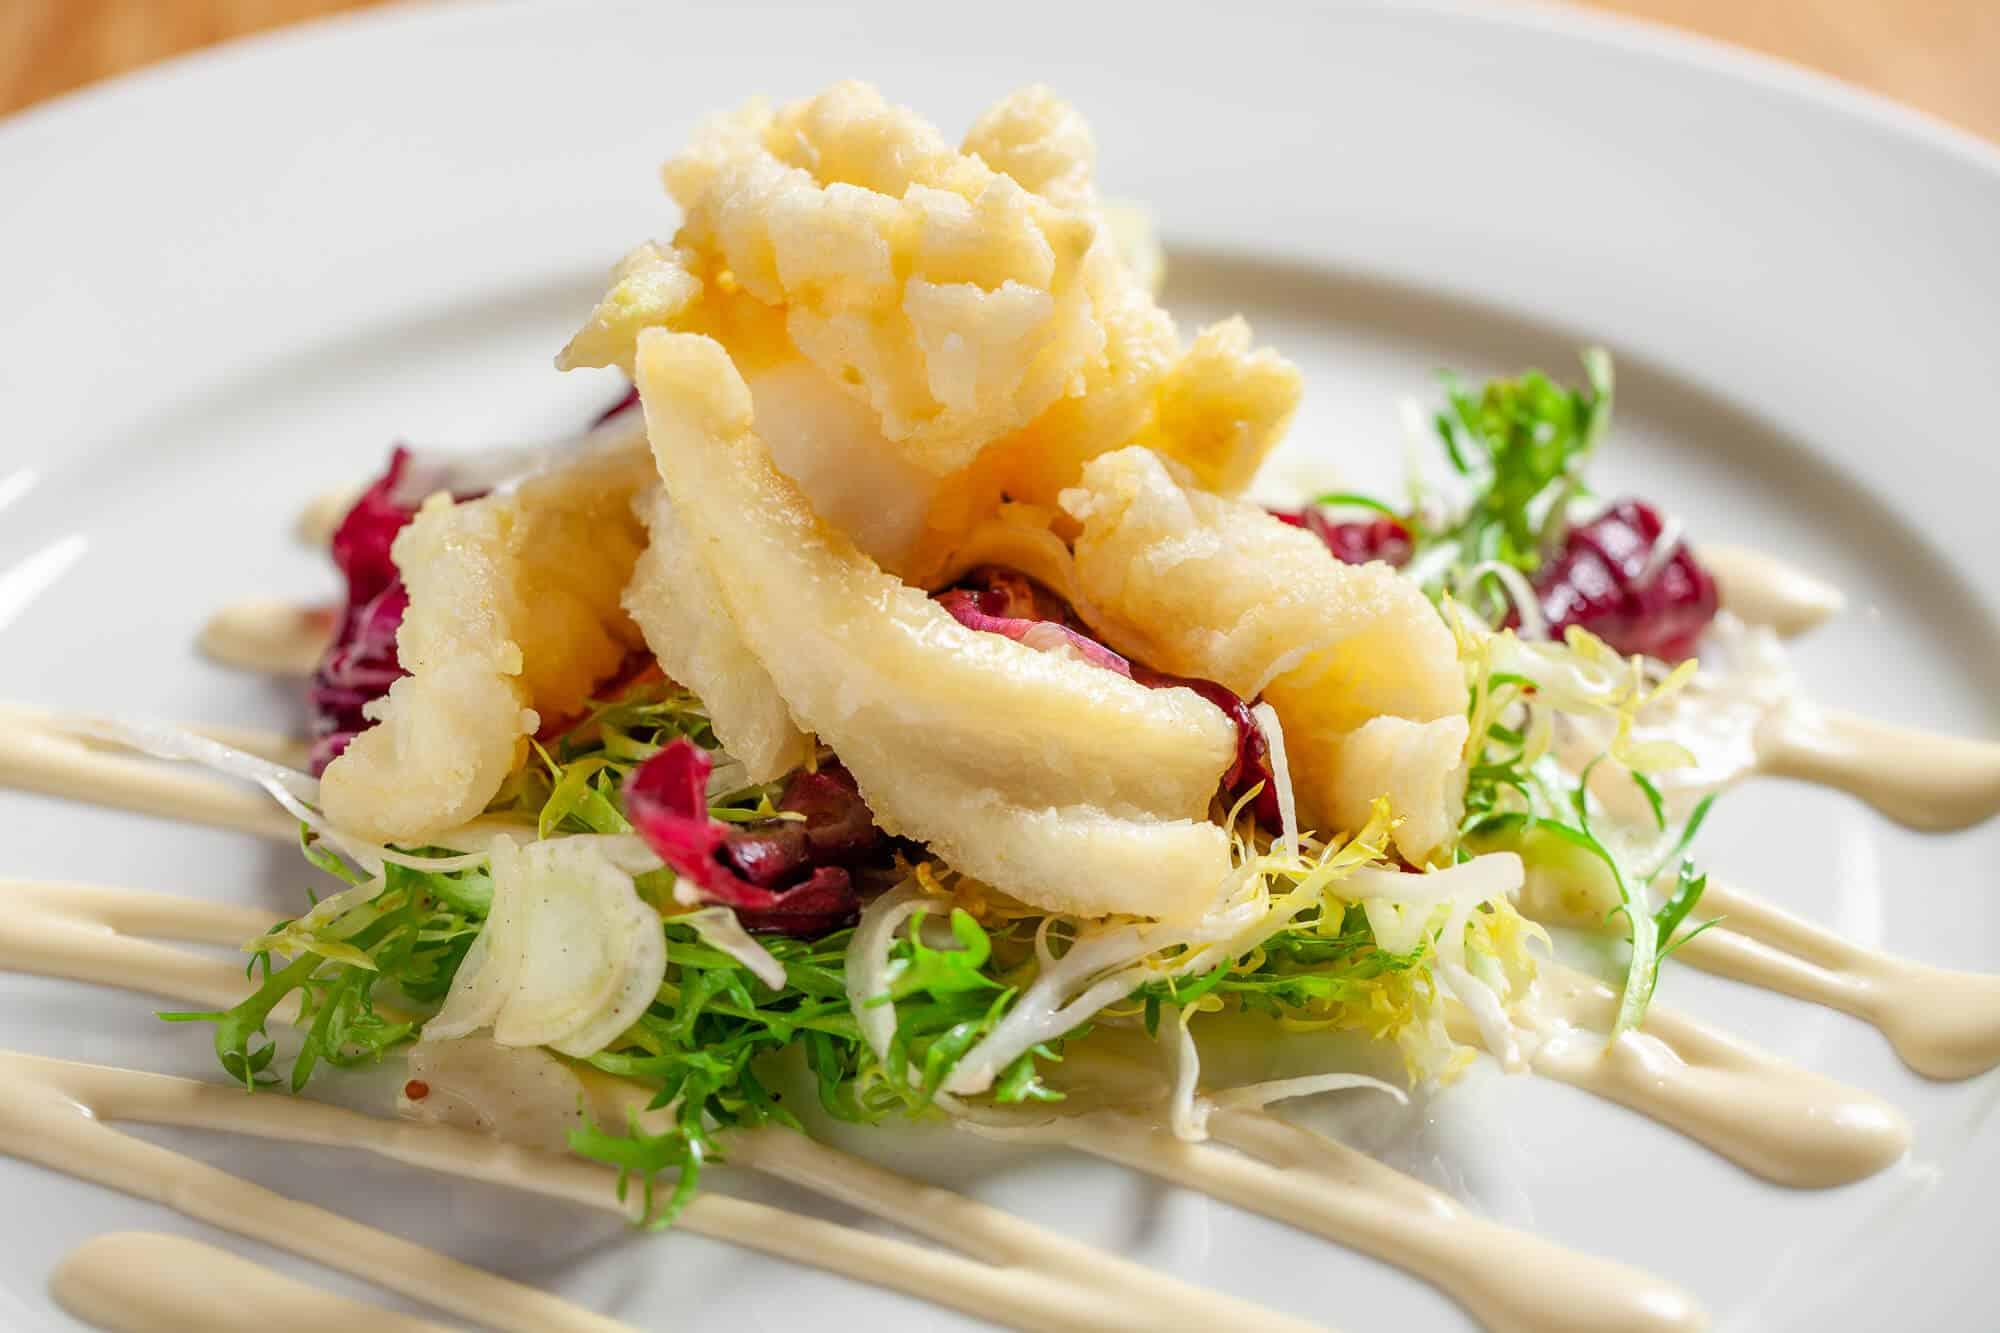 Food Photography. Steven Lloyd Photography